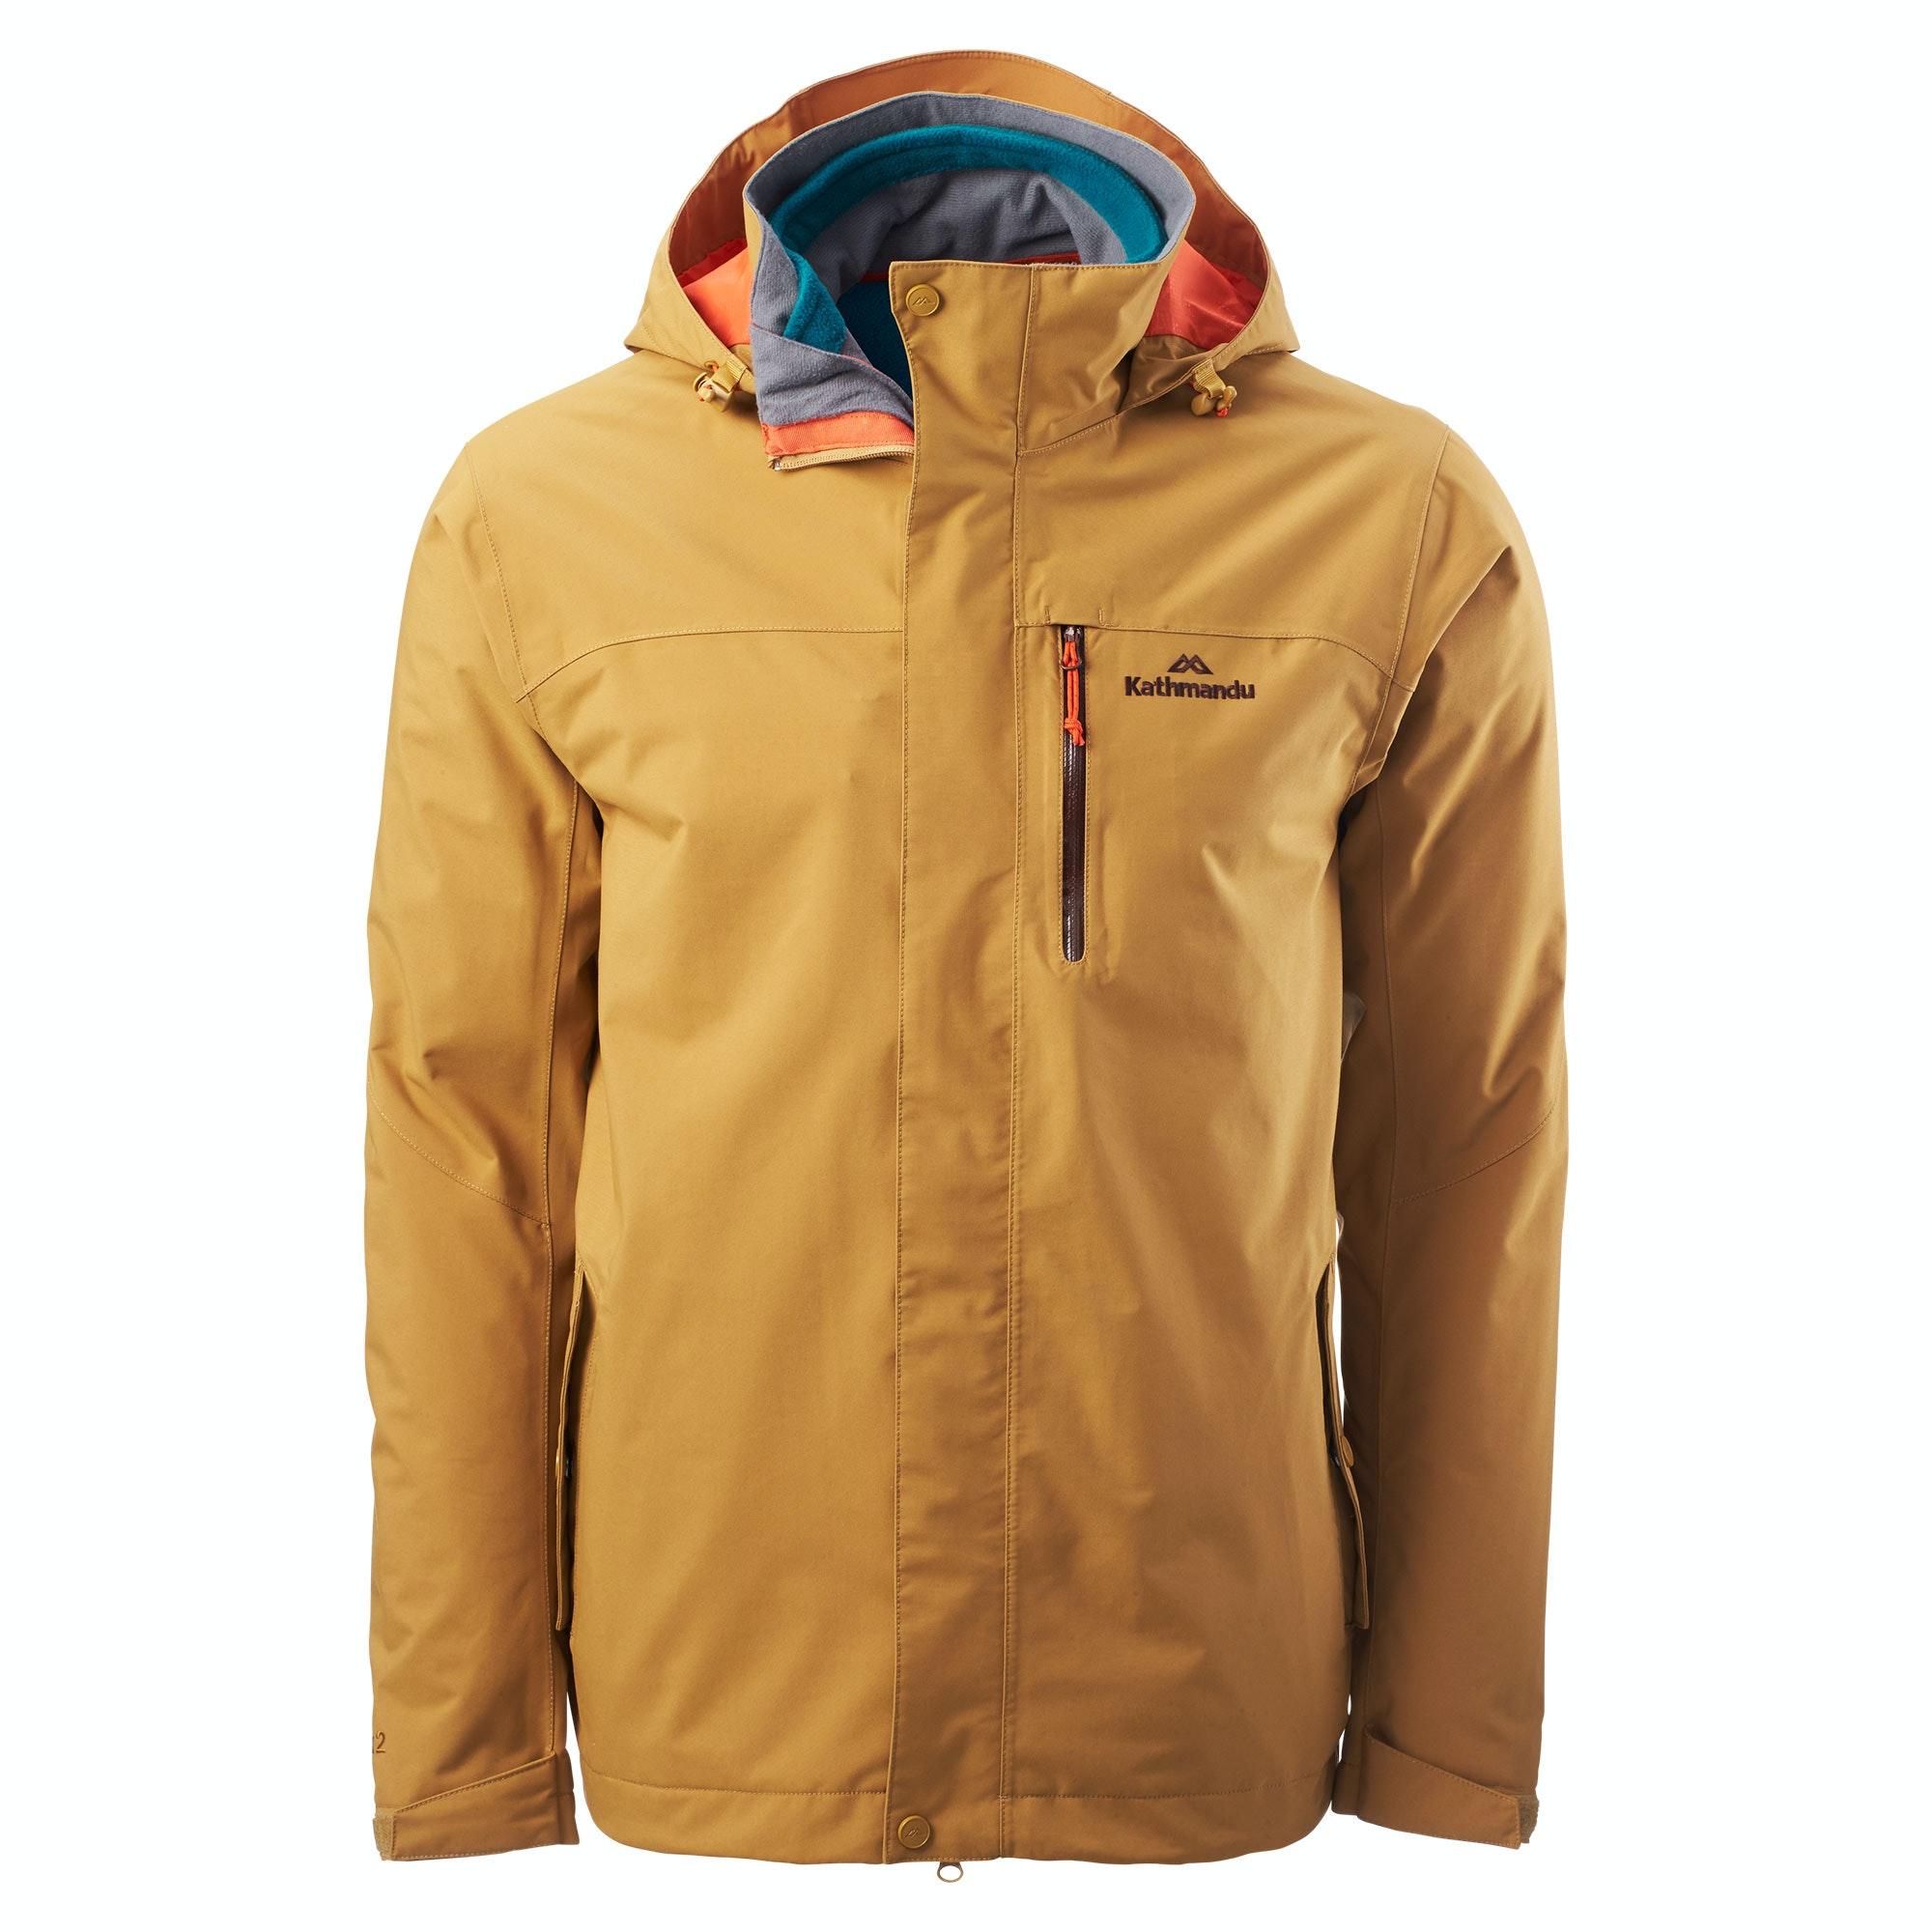 Isograd Men's Waterproof 3 in 1 Jacket v2 - Petrol